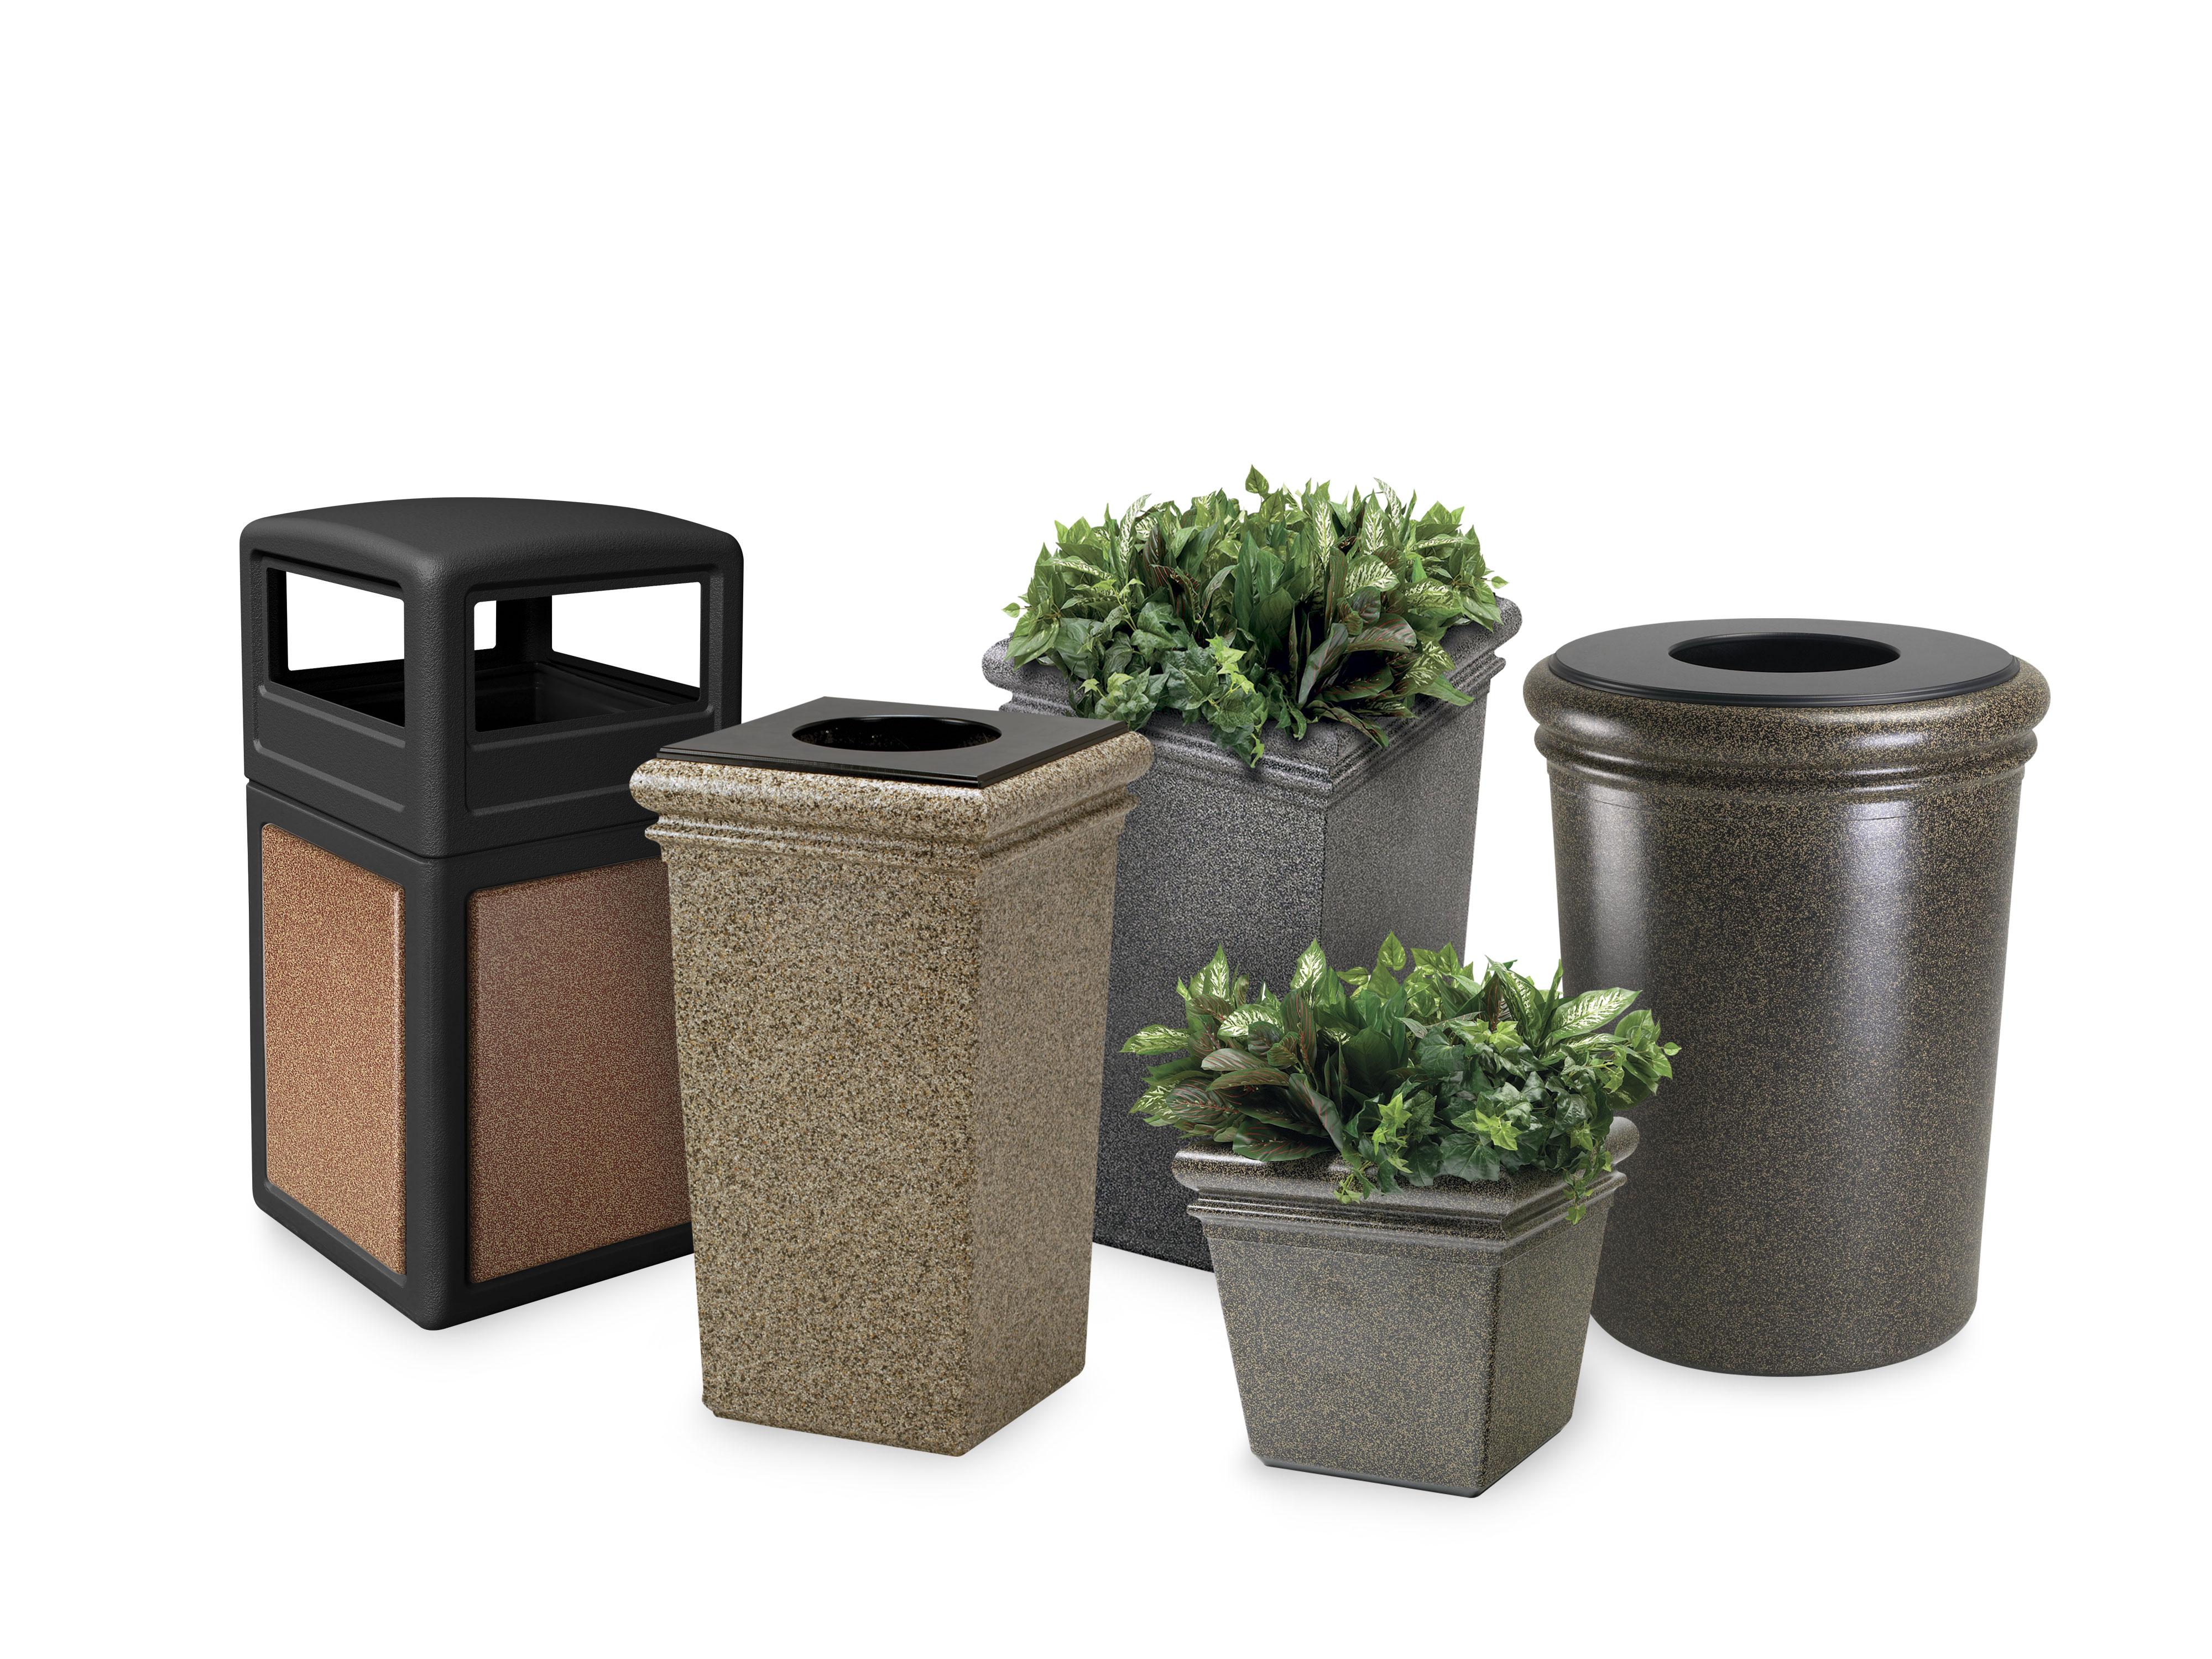 Stone-Tec-Trash-Cans.jpg